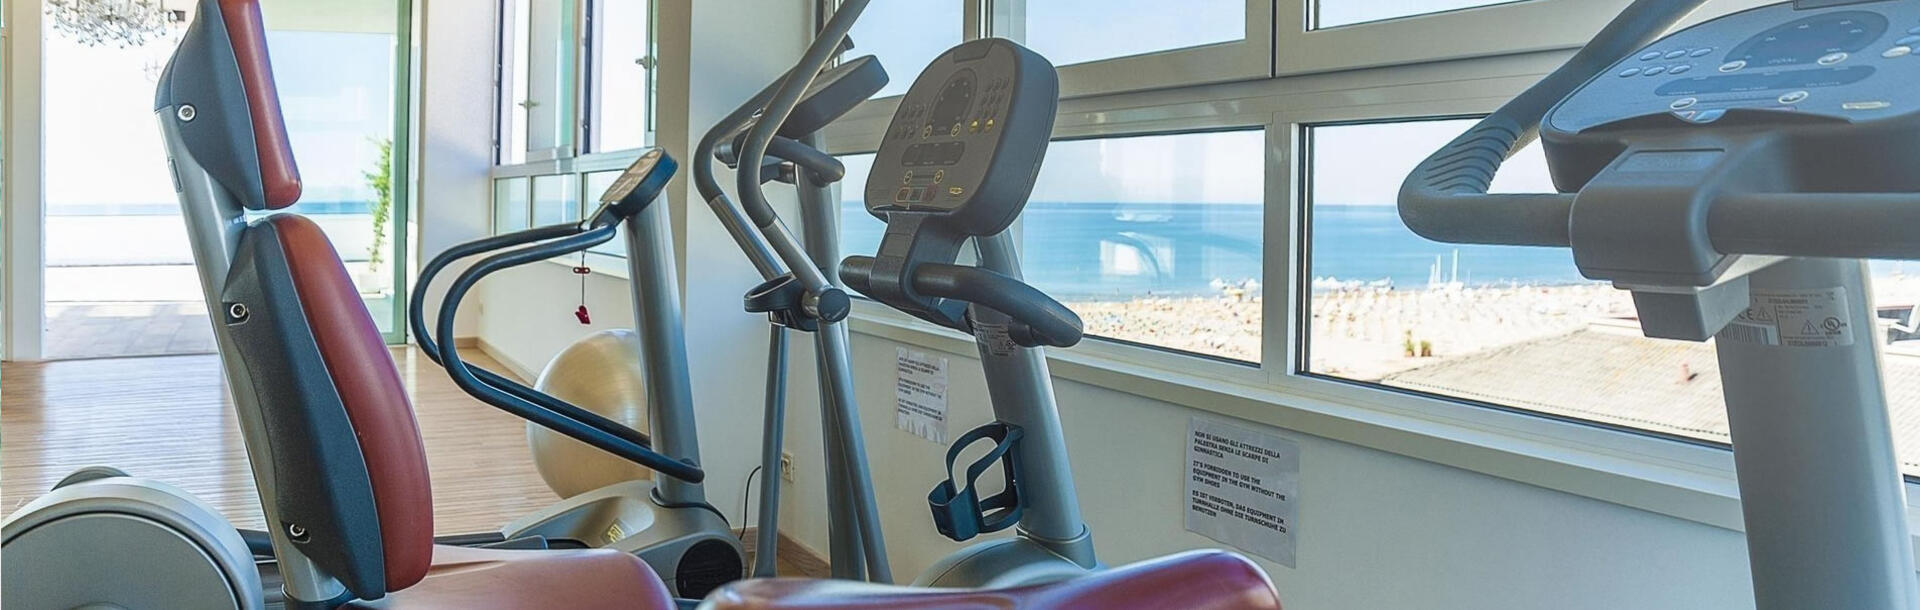 hotel-montecarlo hu edzoterem-sportos-nyaralas 013